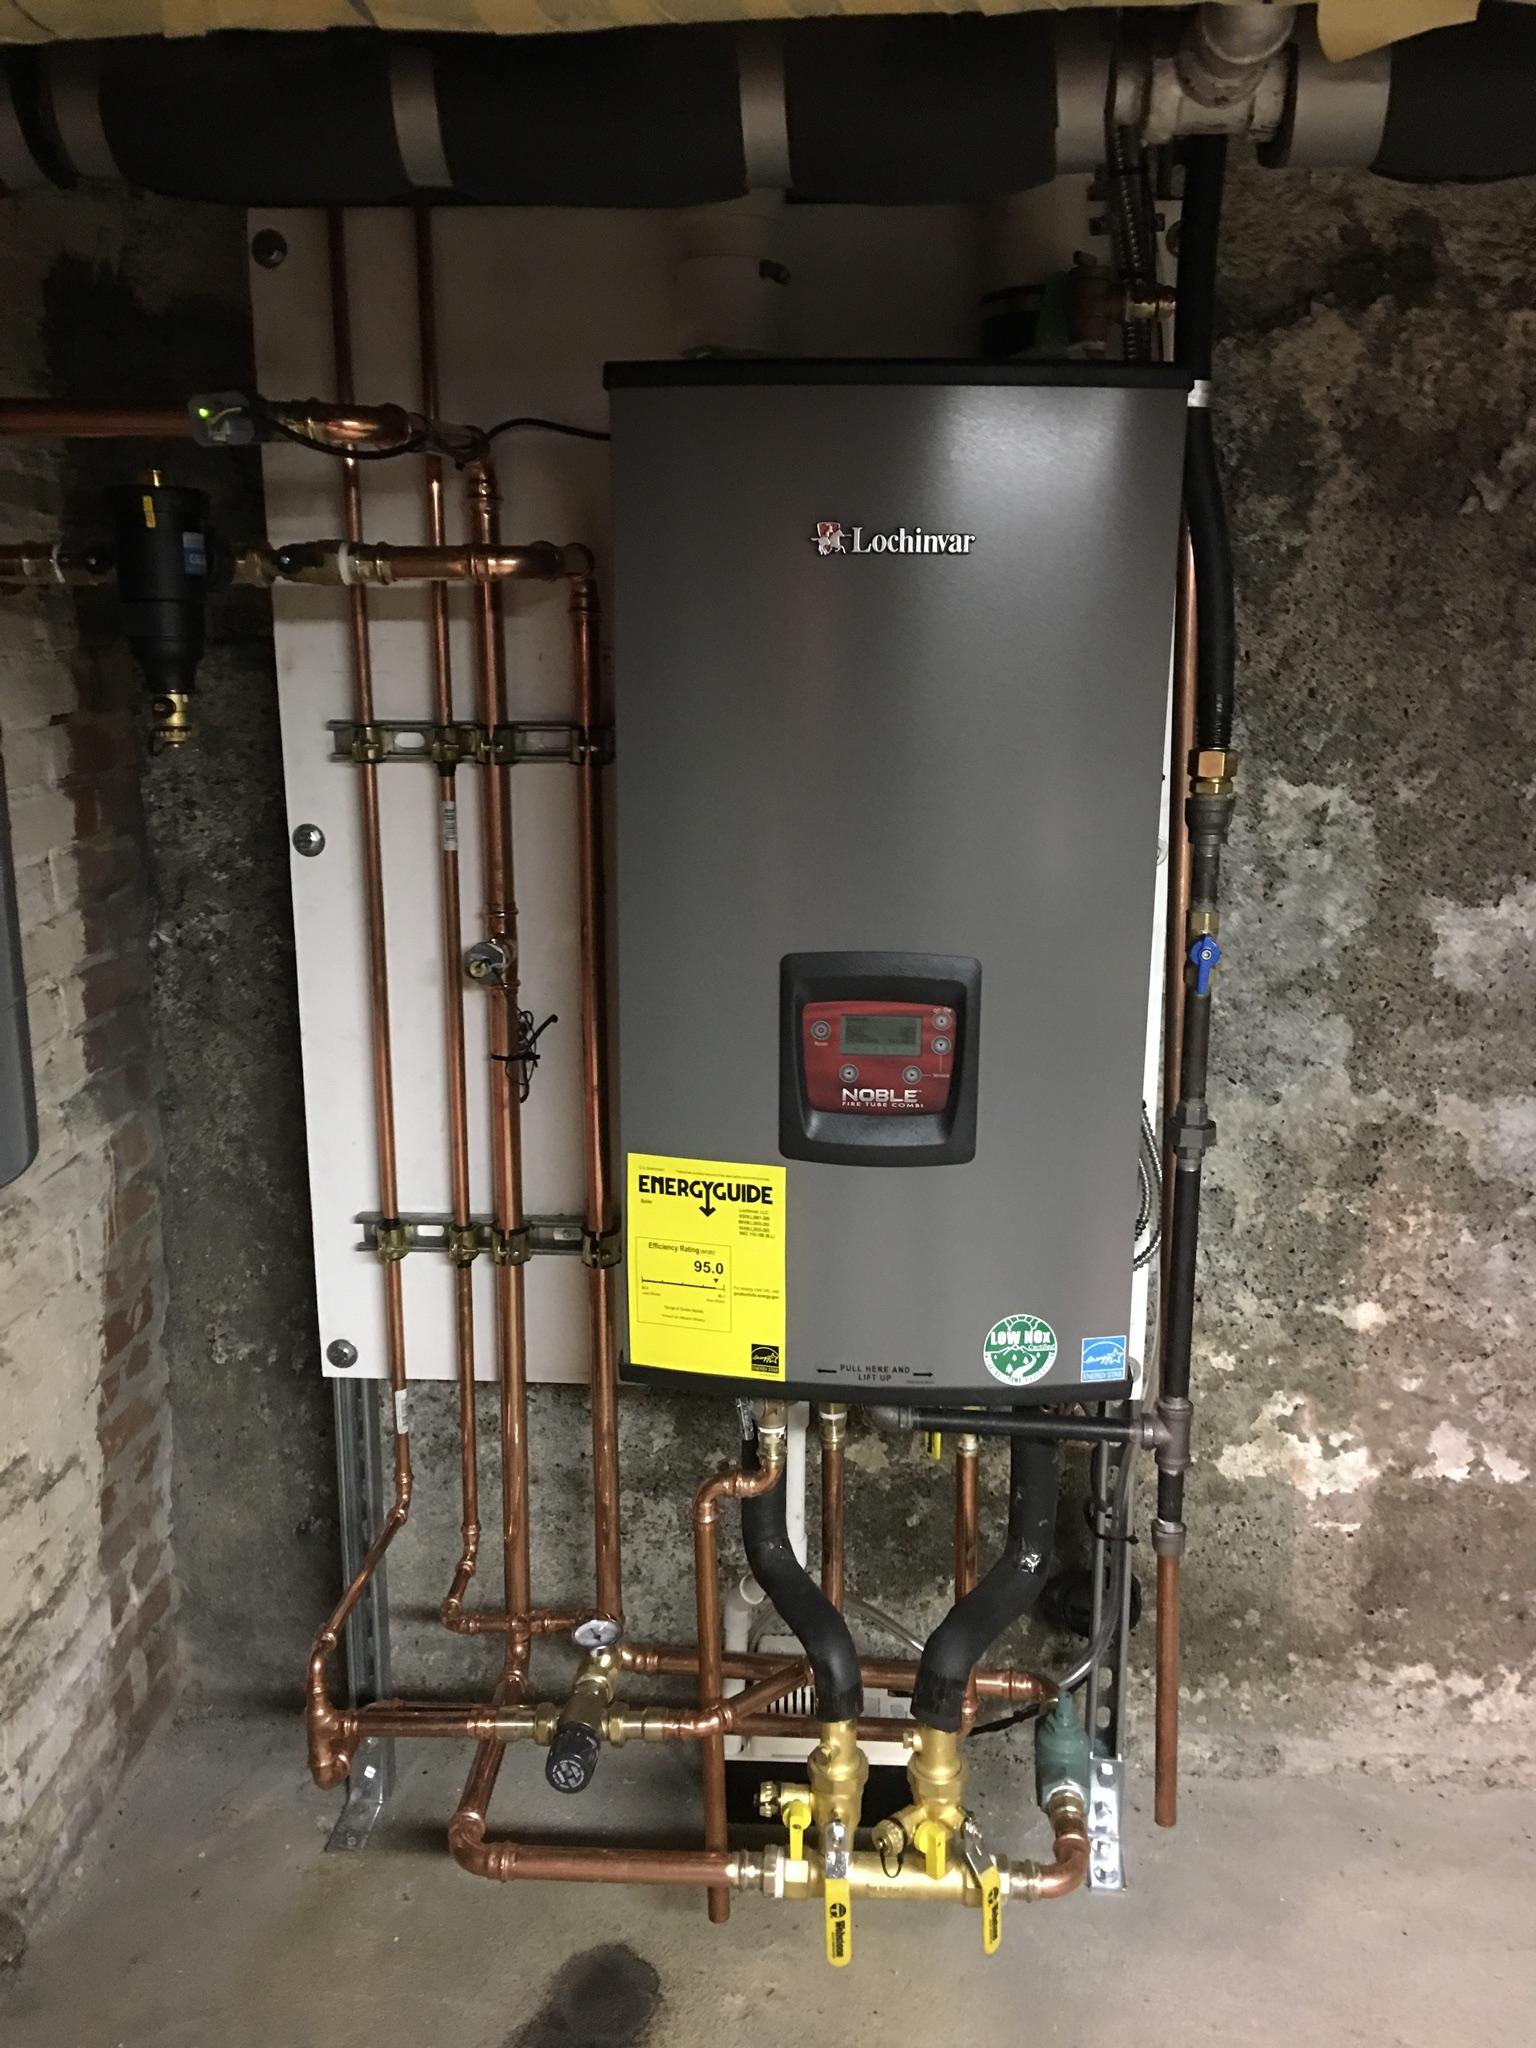 Lochinvar 50 Gallon Gas Water Heater Reviews Best Water